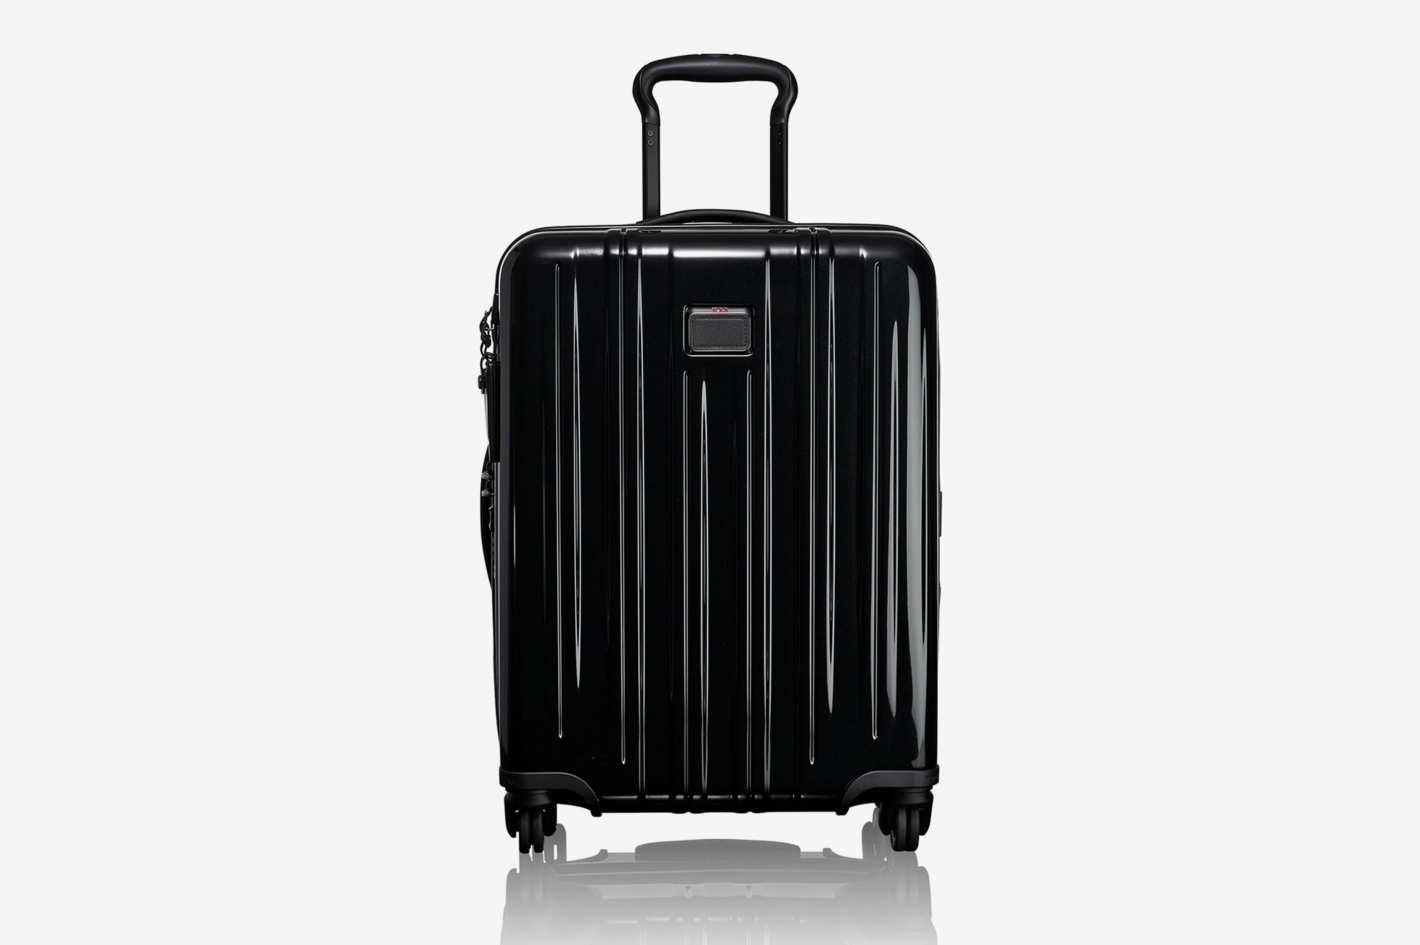 Tumi Continental Hardside Carry-On Suitcase Luggage